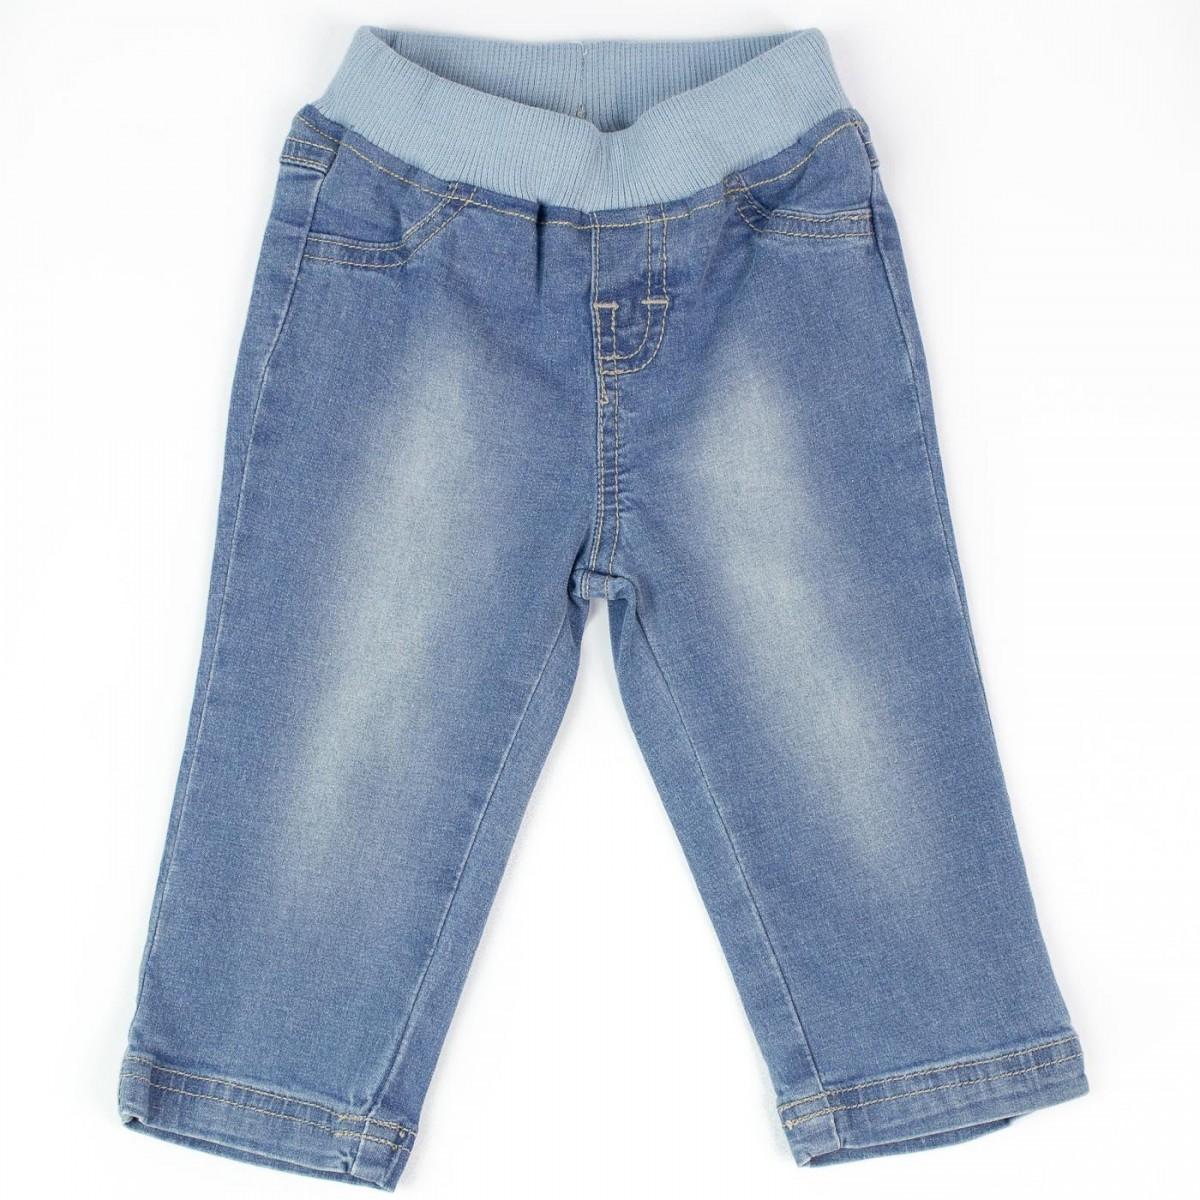 555558785 Bizz Store - Calça Jeans Infantil Masculina Hering Kids Azul